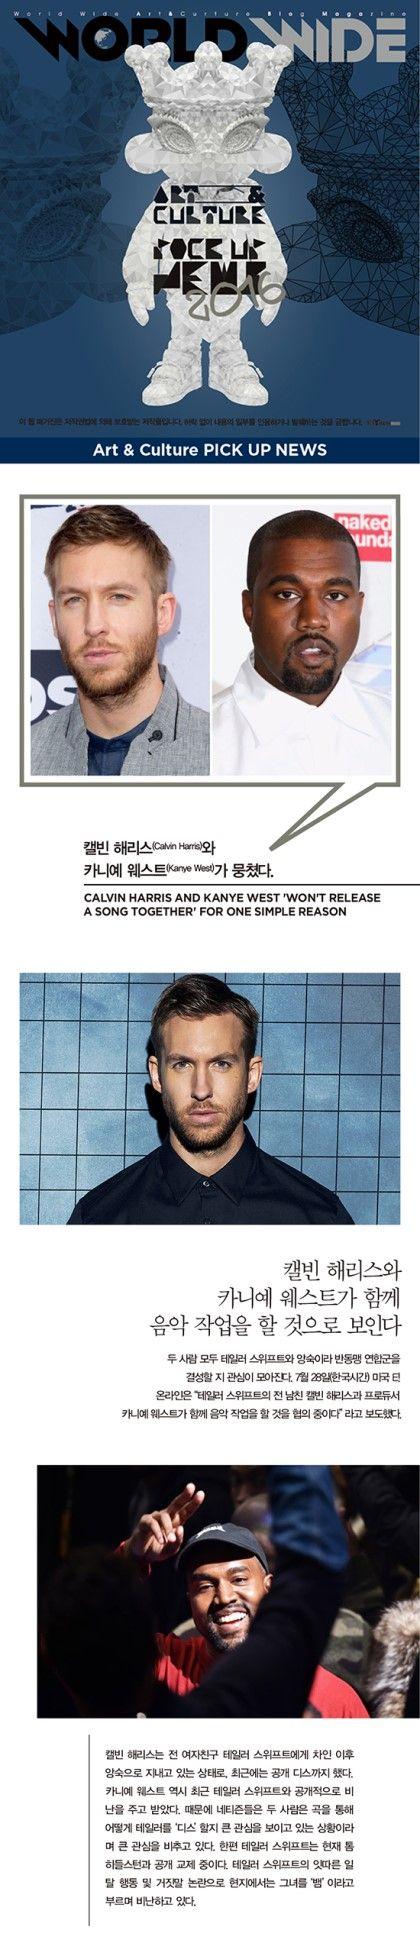 Blog Magazine ● WORLD WIDE: Art & Culture PICK UP NEWS∥캘빈 해리스(Calvin Harris)와 카니예 웨스트(Kanye West)가 뭉쳤다